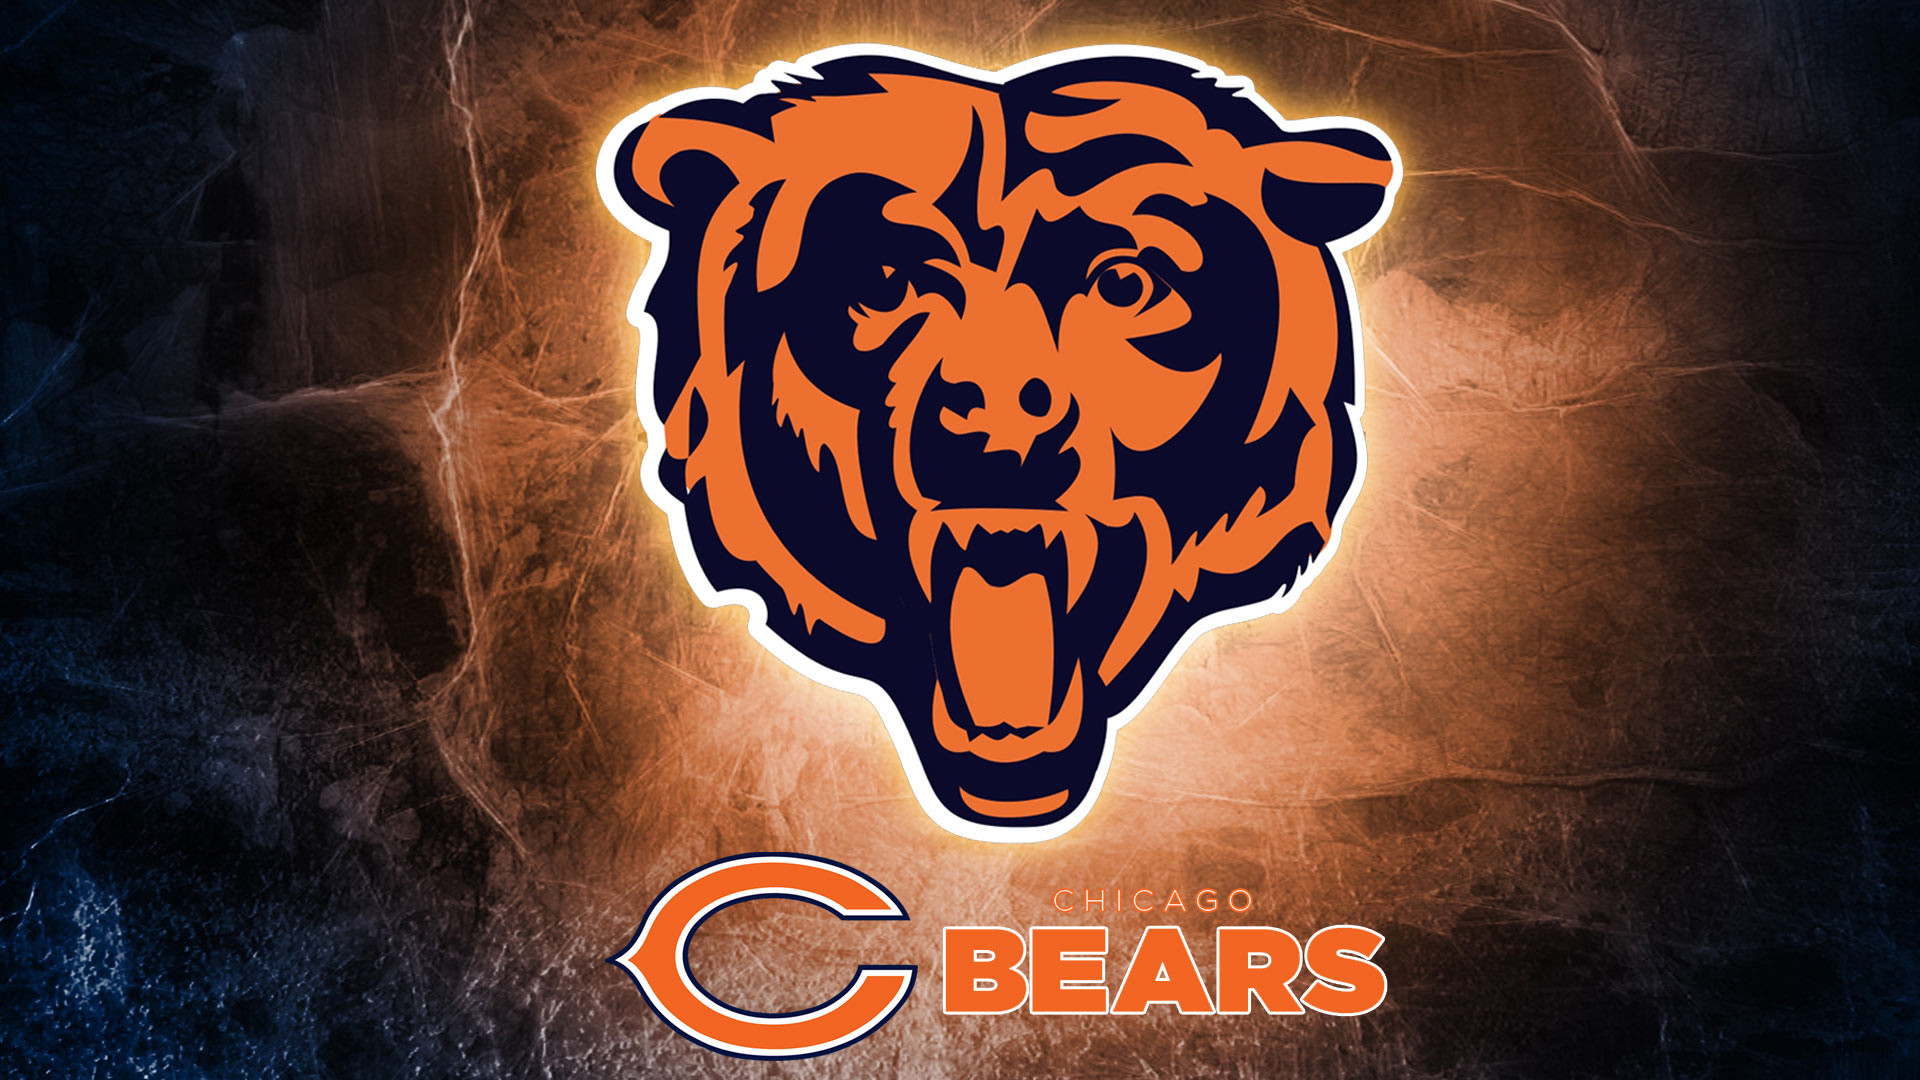 Chicago Bears Screensavers Wallpapers